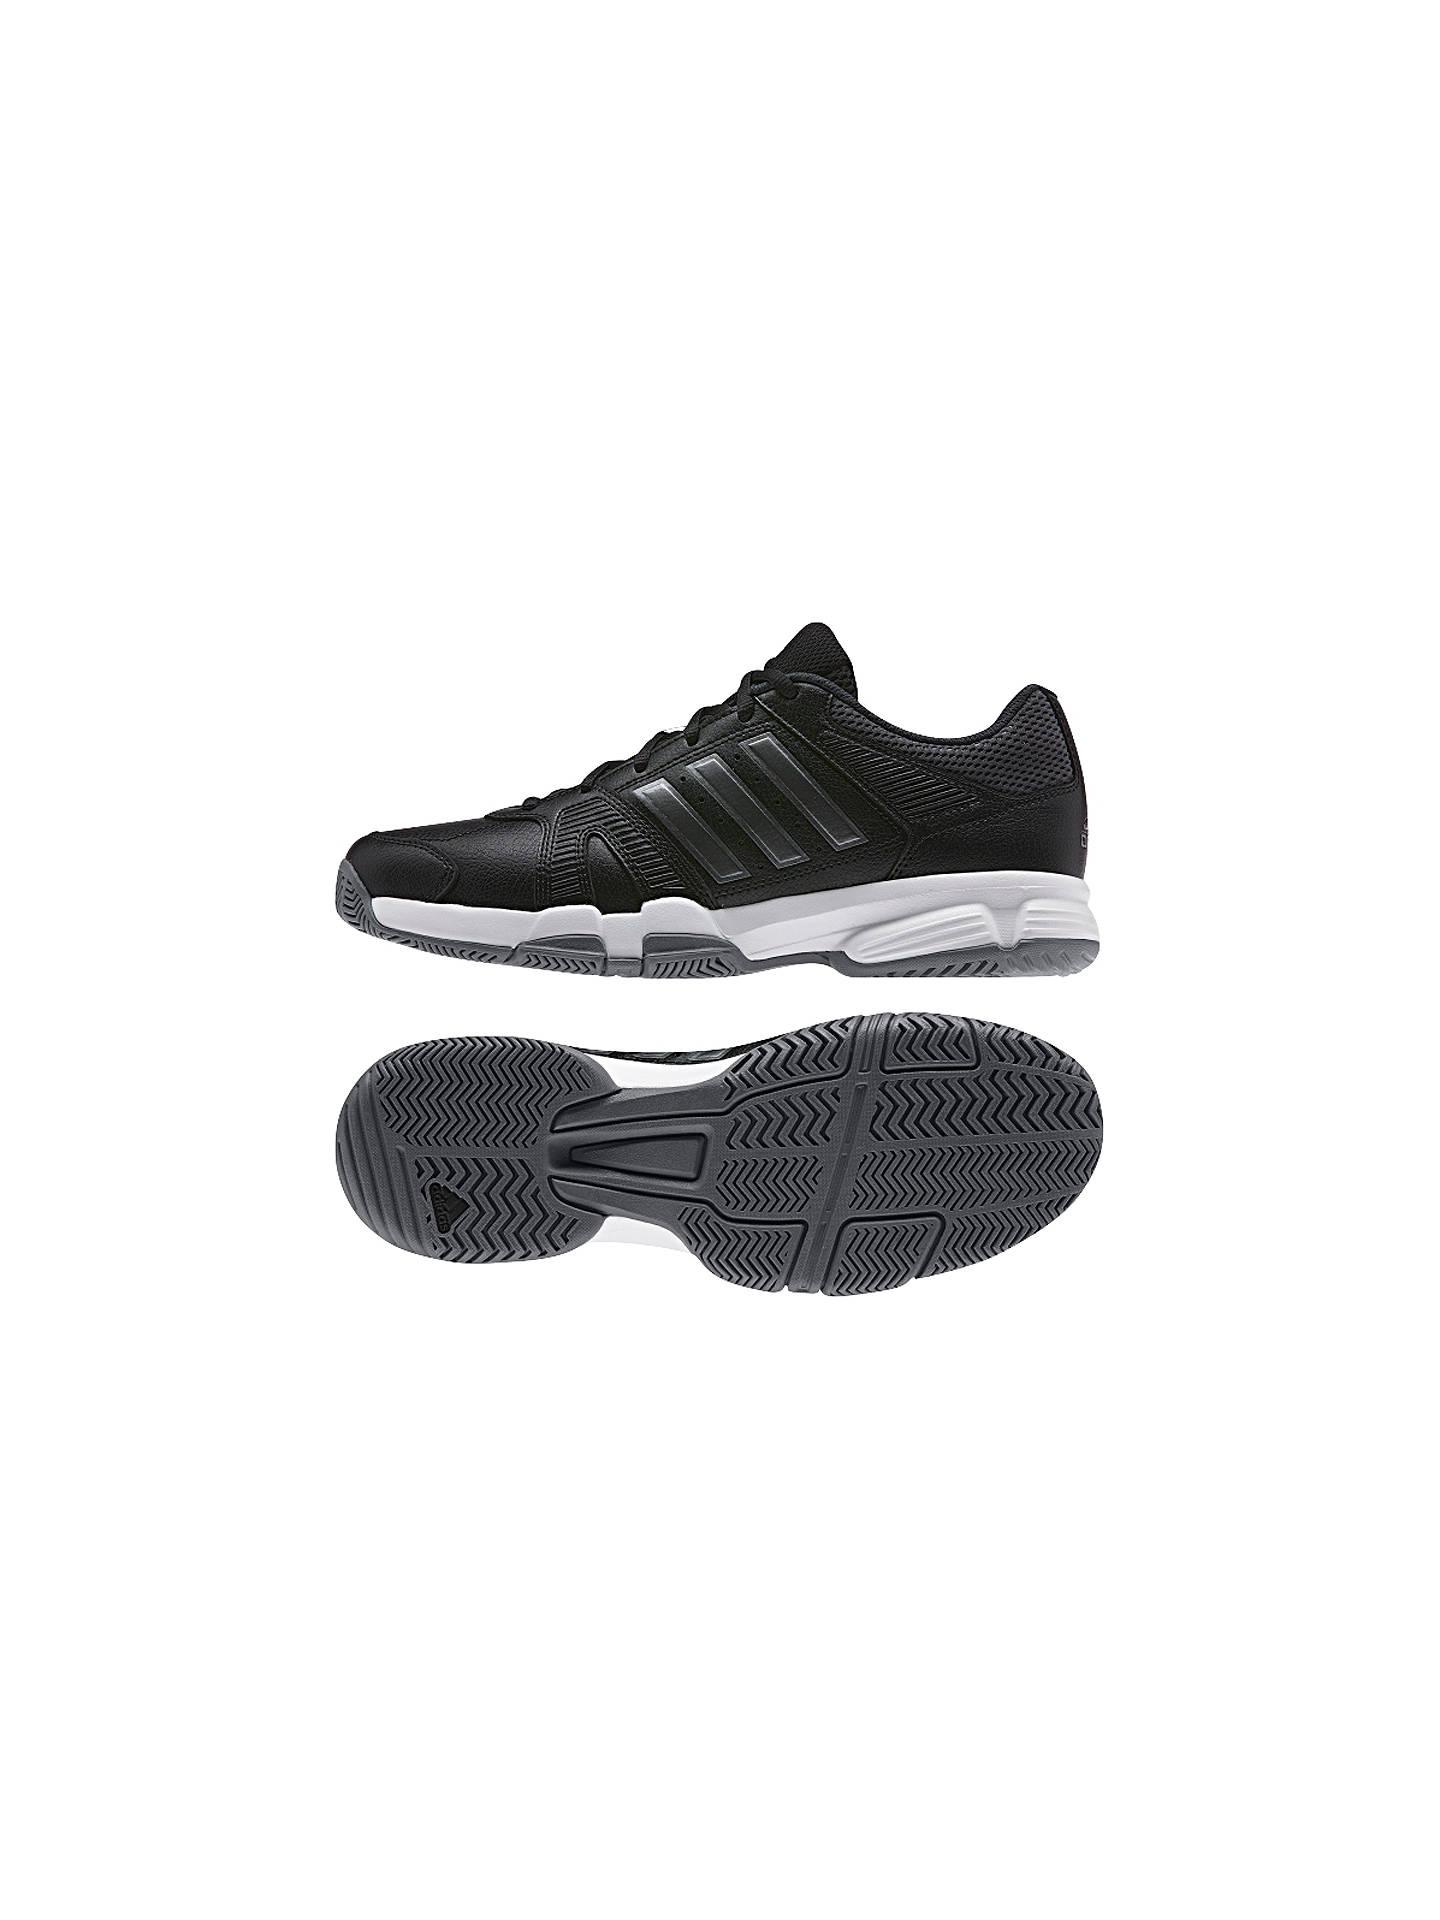 4c48c935eed62e ... Buy Adidas Barracks F10 Men's Cross Trainers, Black/Grey, 7 Online at  johnlewis ...